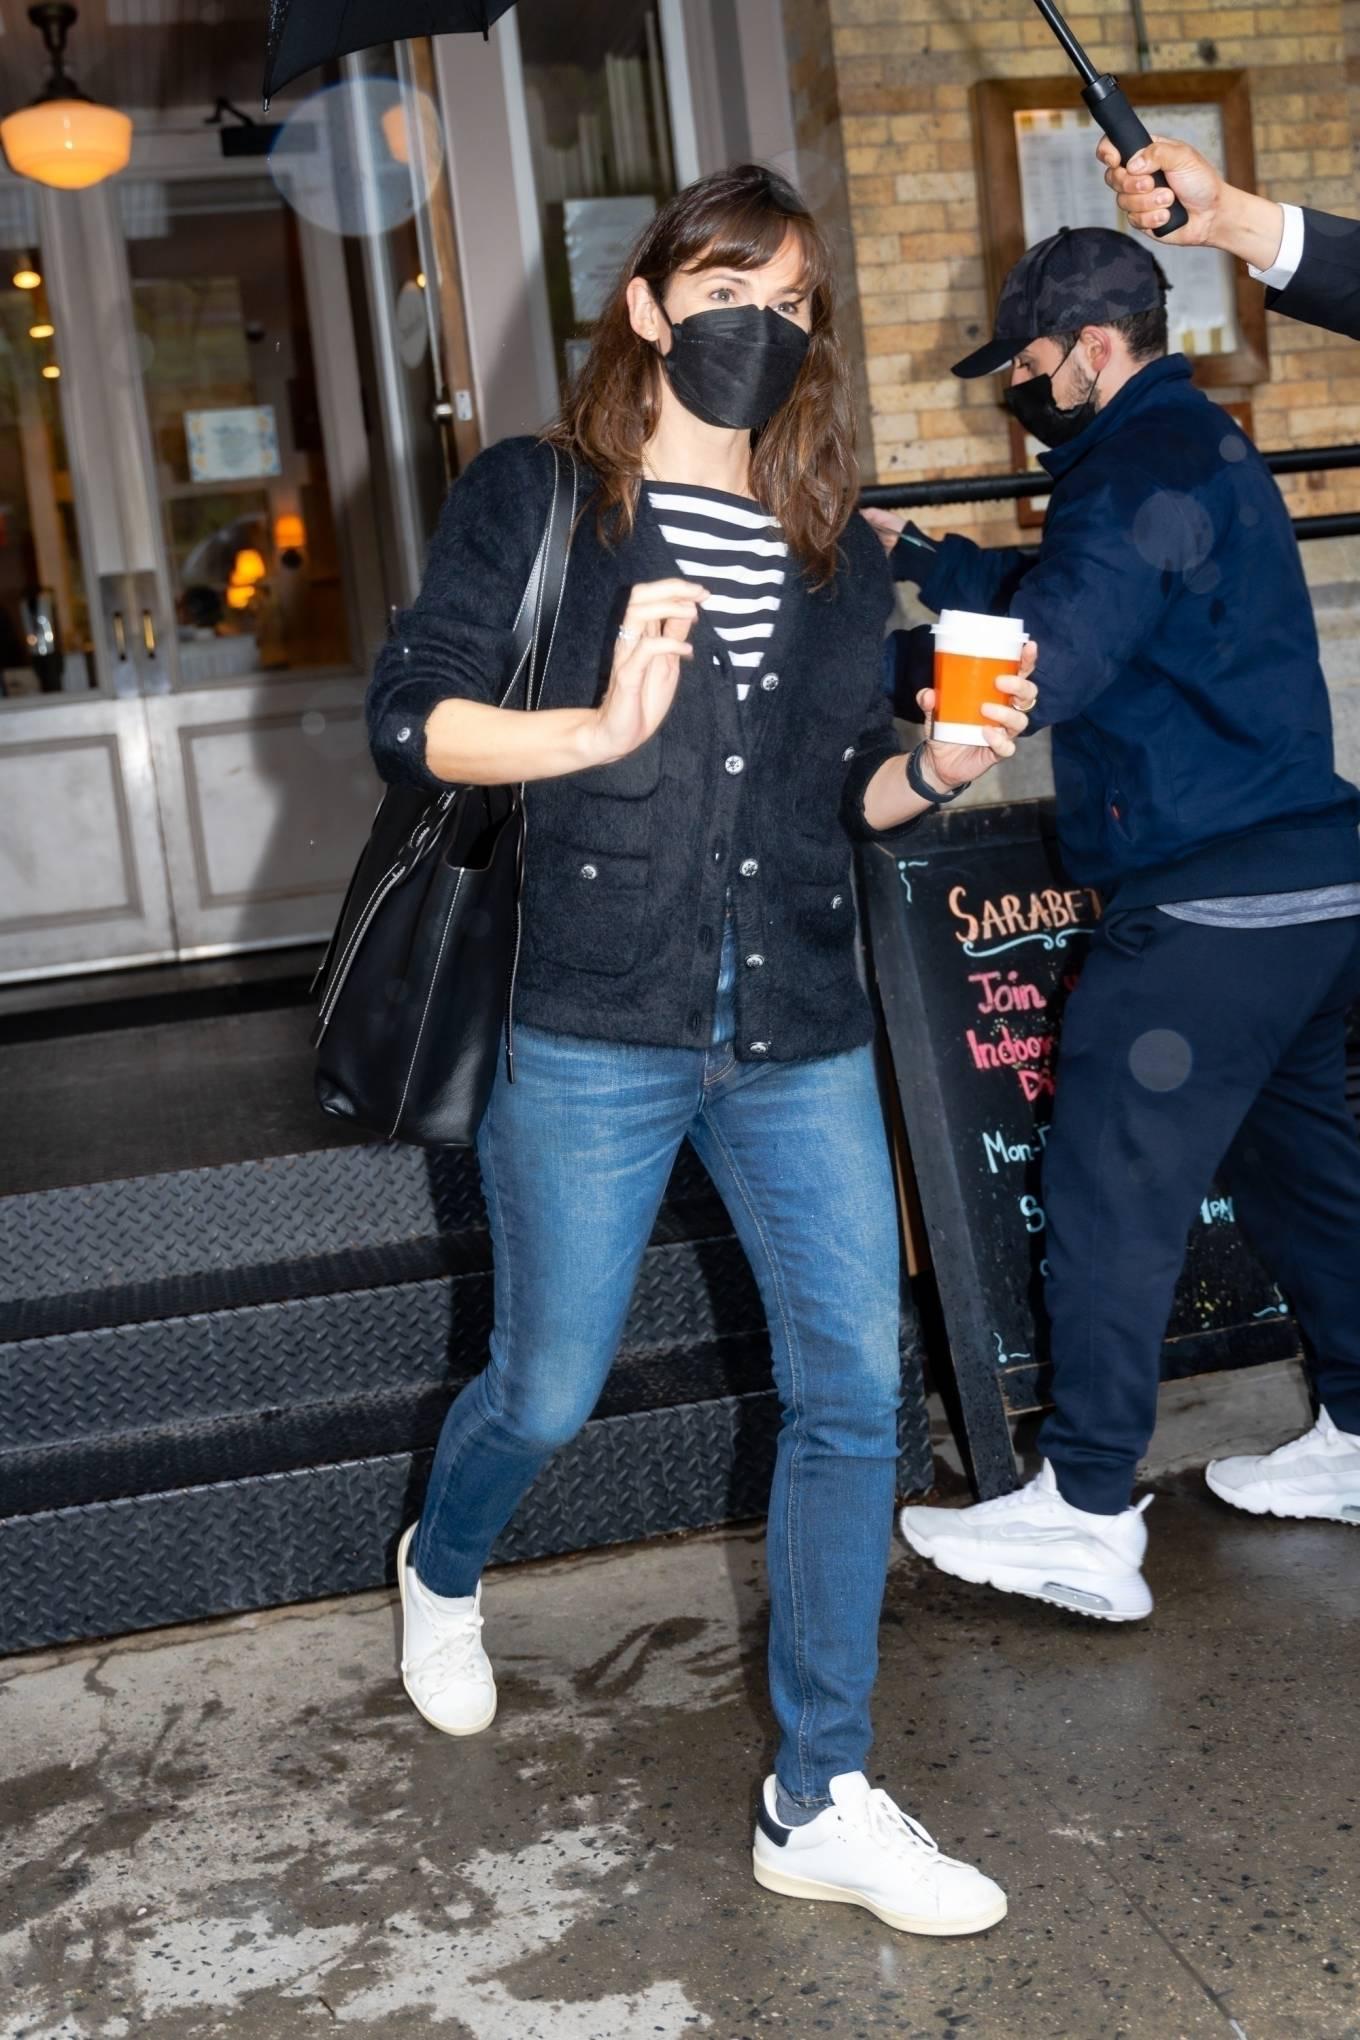 Jennifer Garner 2021 : Jennifer Garner – Out on rainy day for shopping at Sarabeths in New York-09